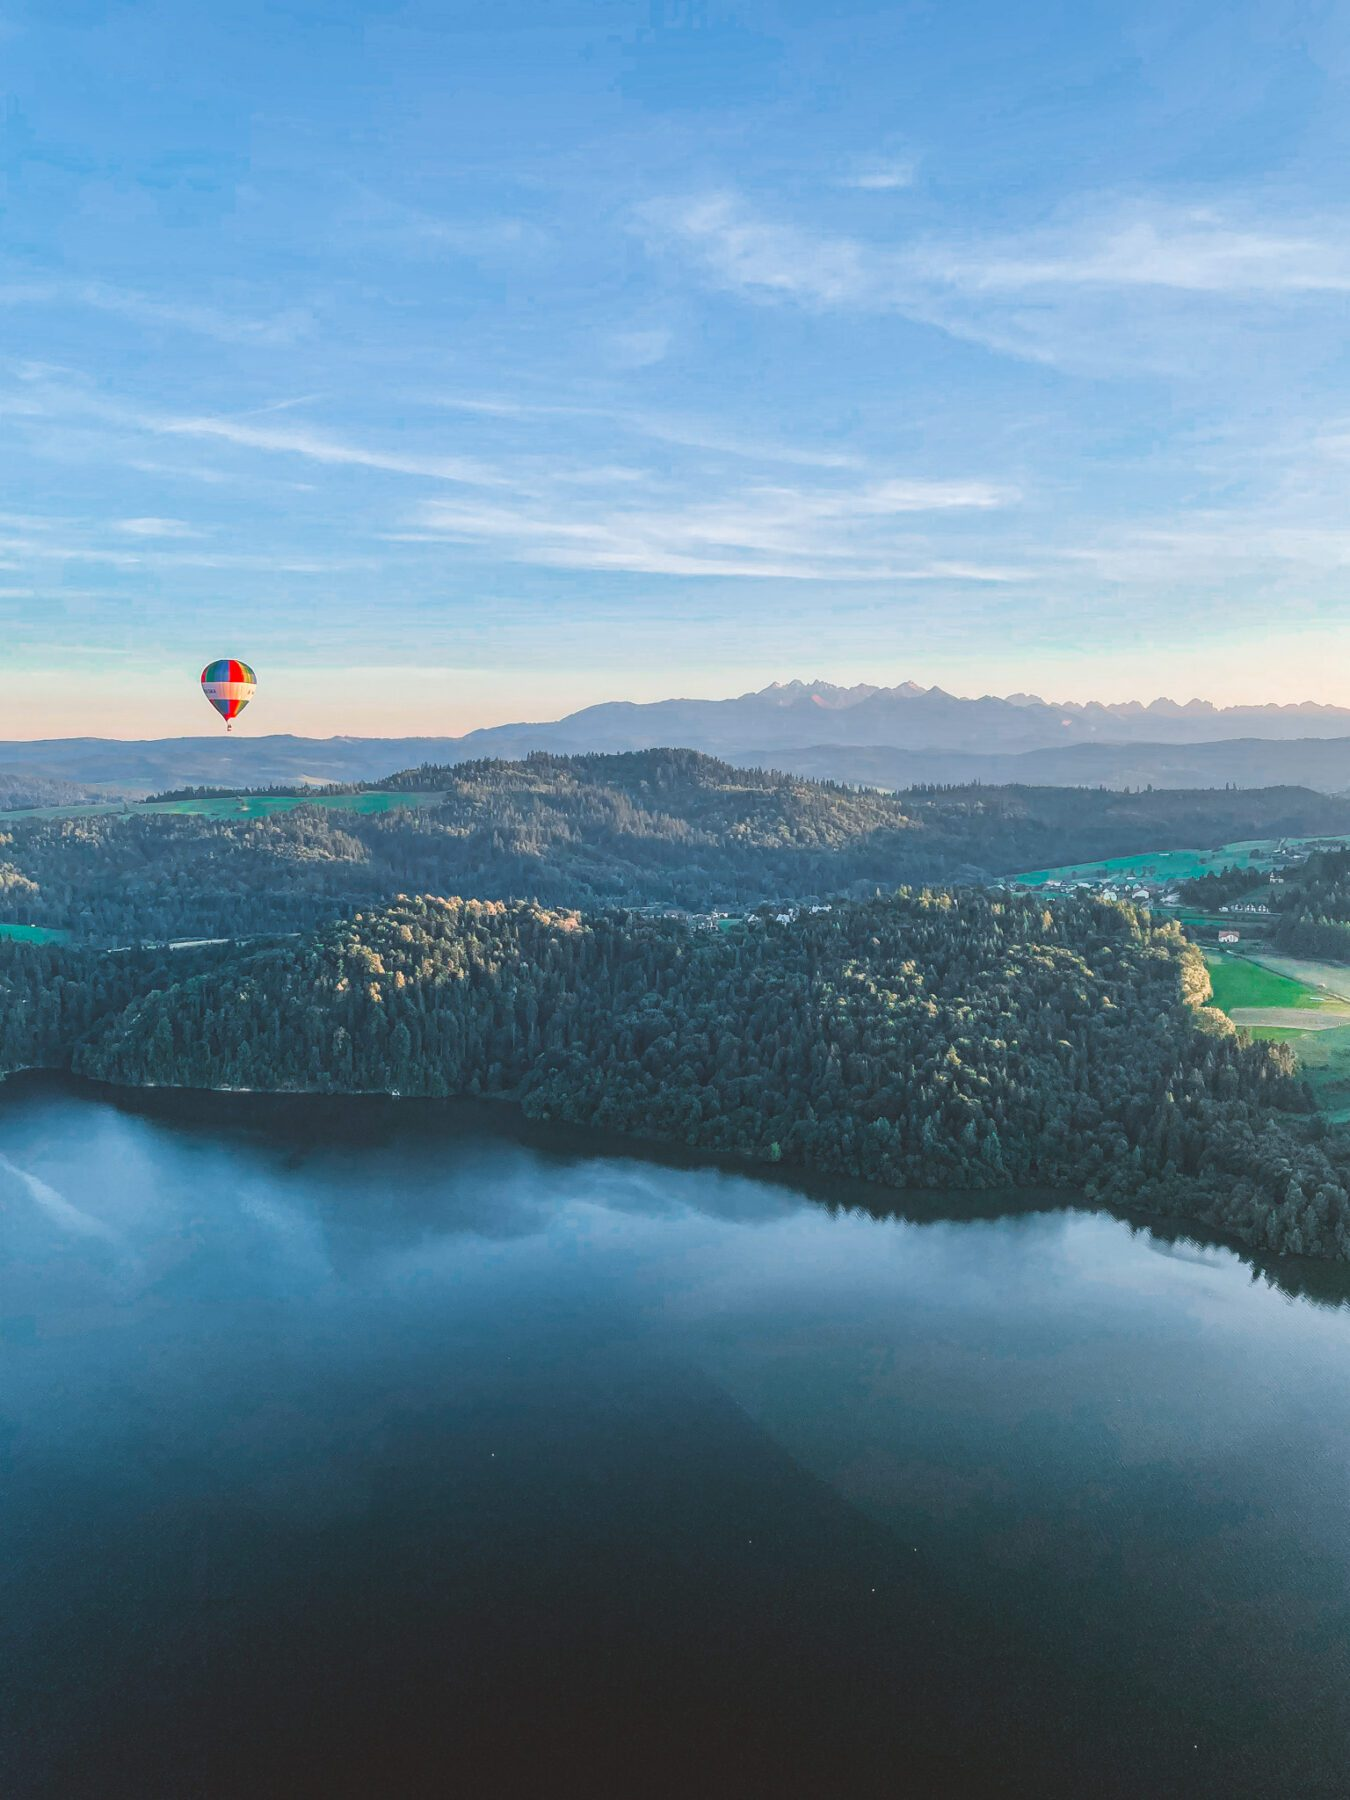 VeloMalopolska luchtballon in Polen